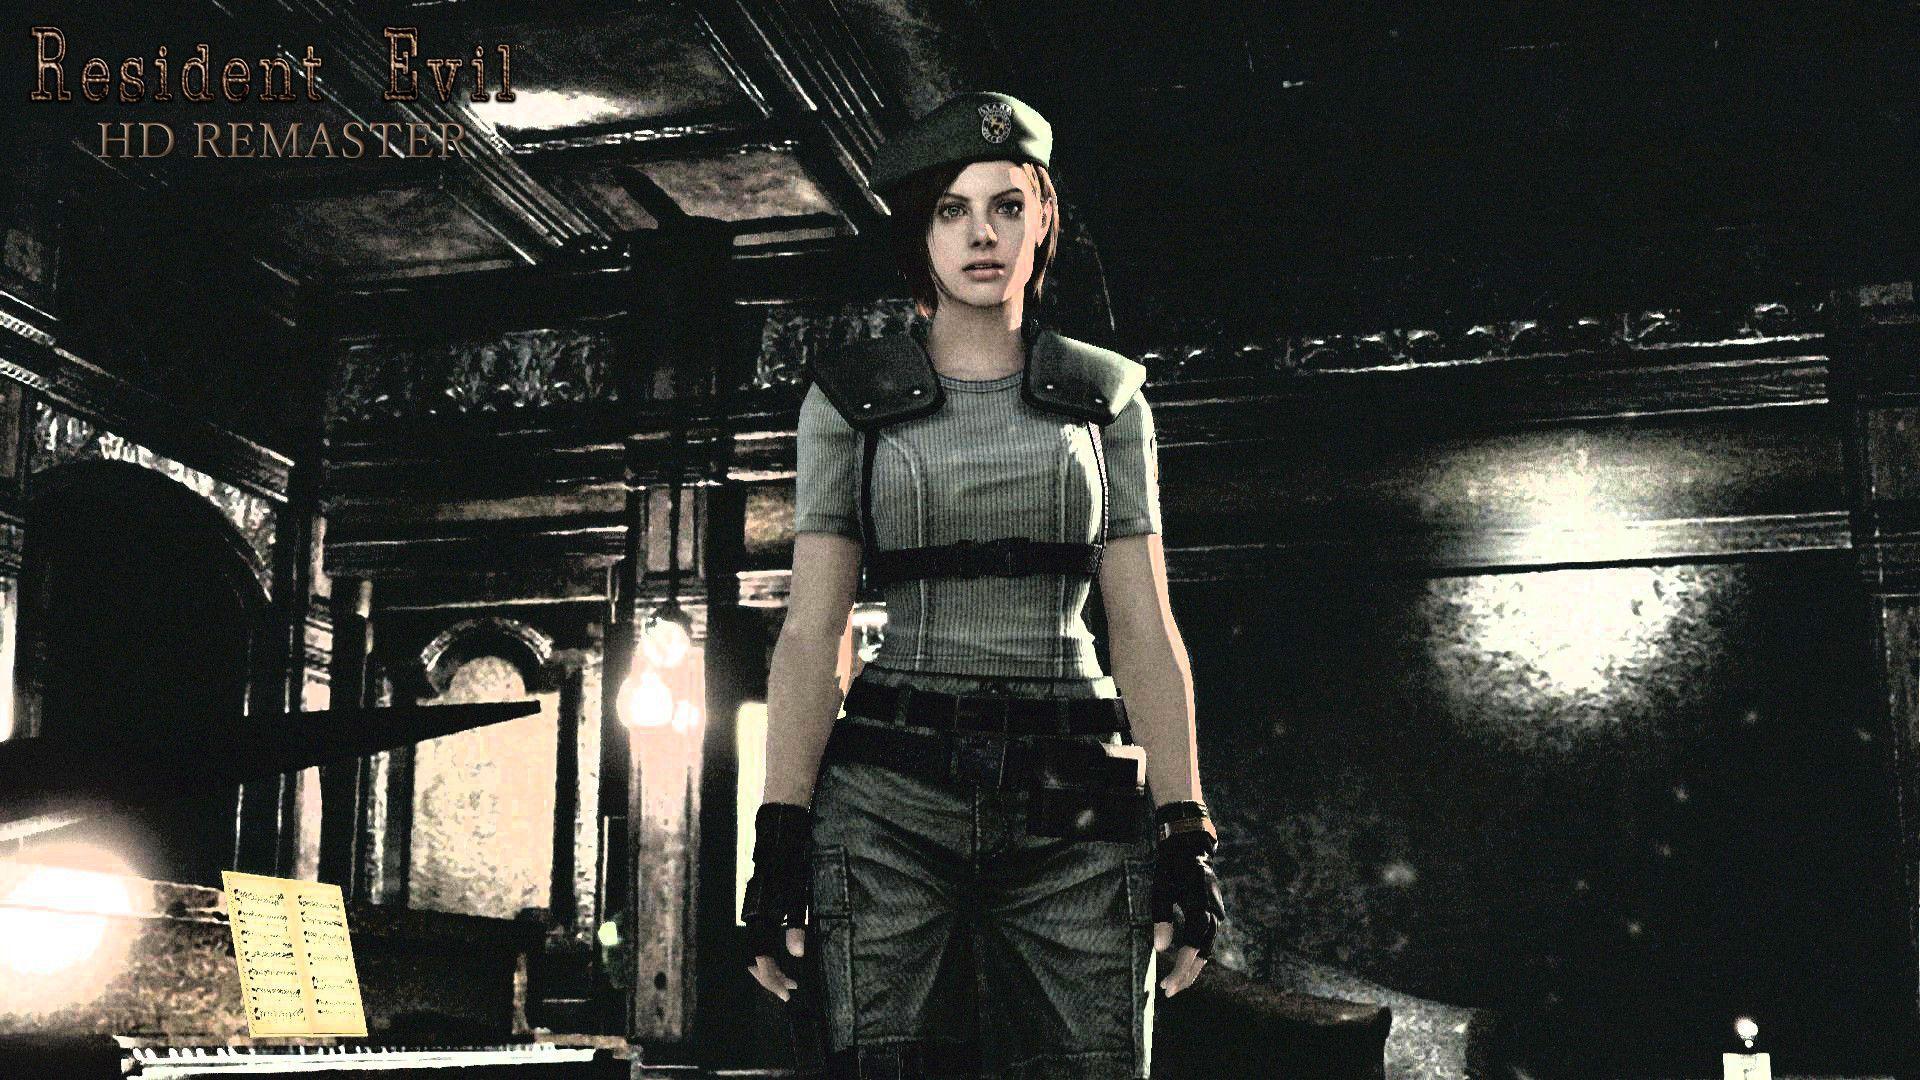 Resident Evil Revelations Jill Valentine Wallpapers Hd Wallpaper